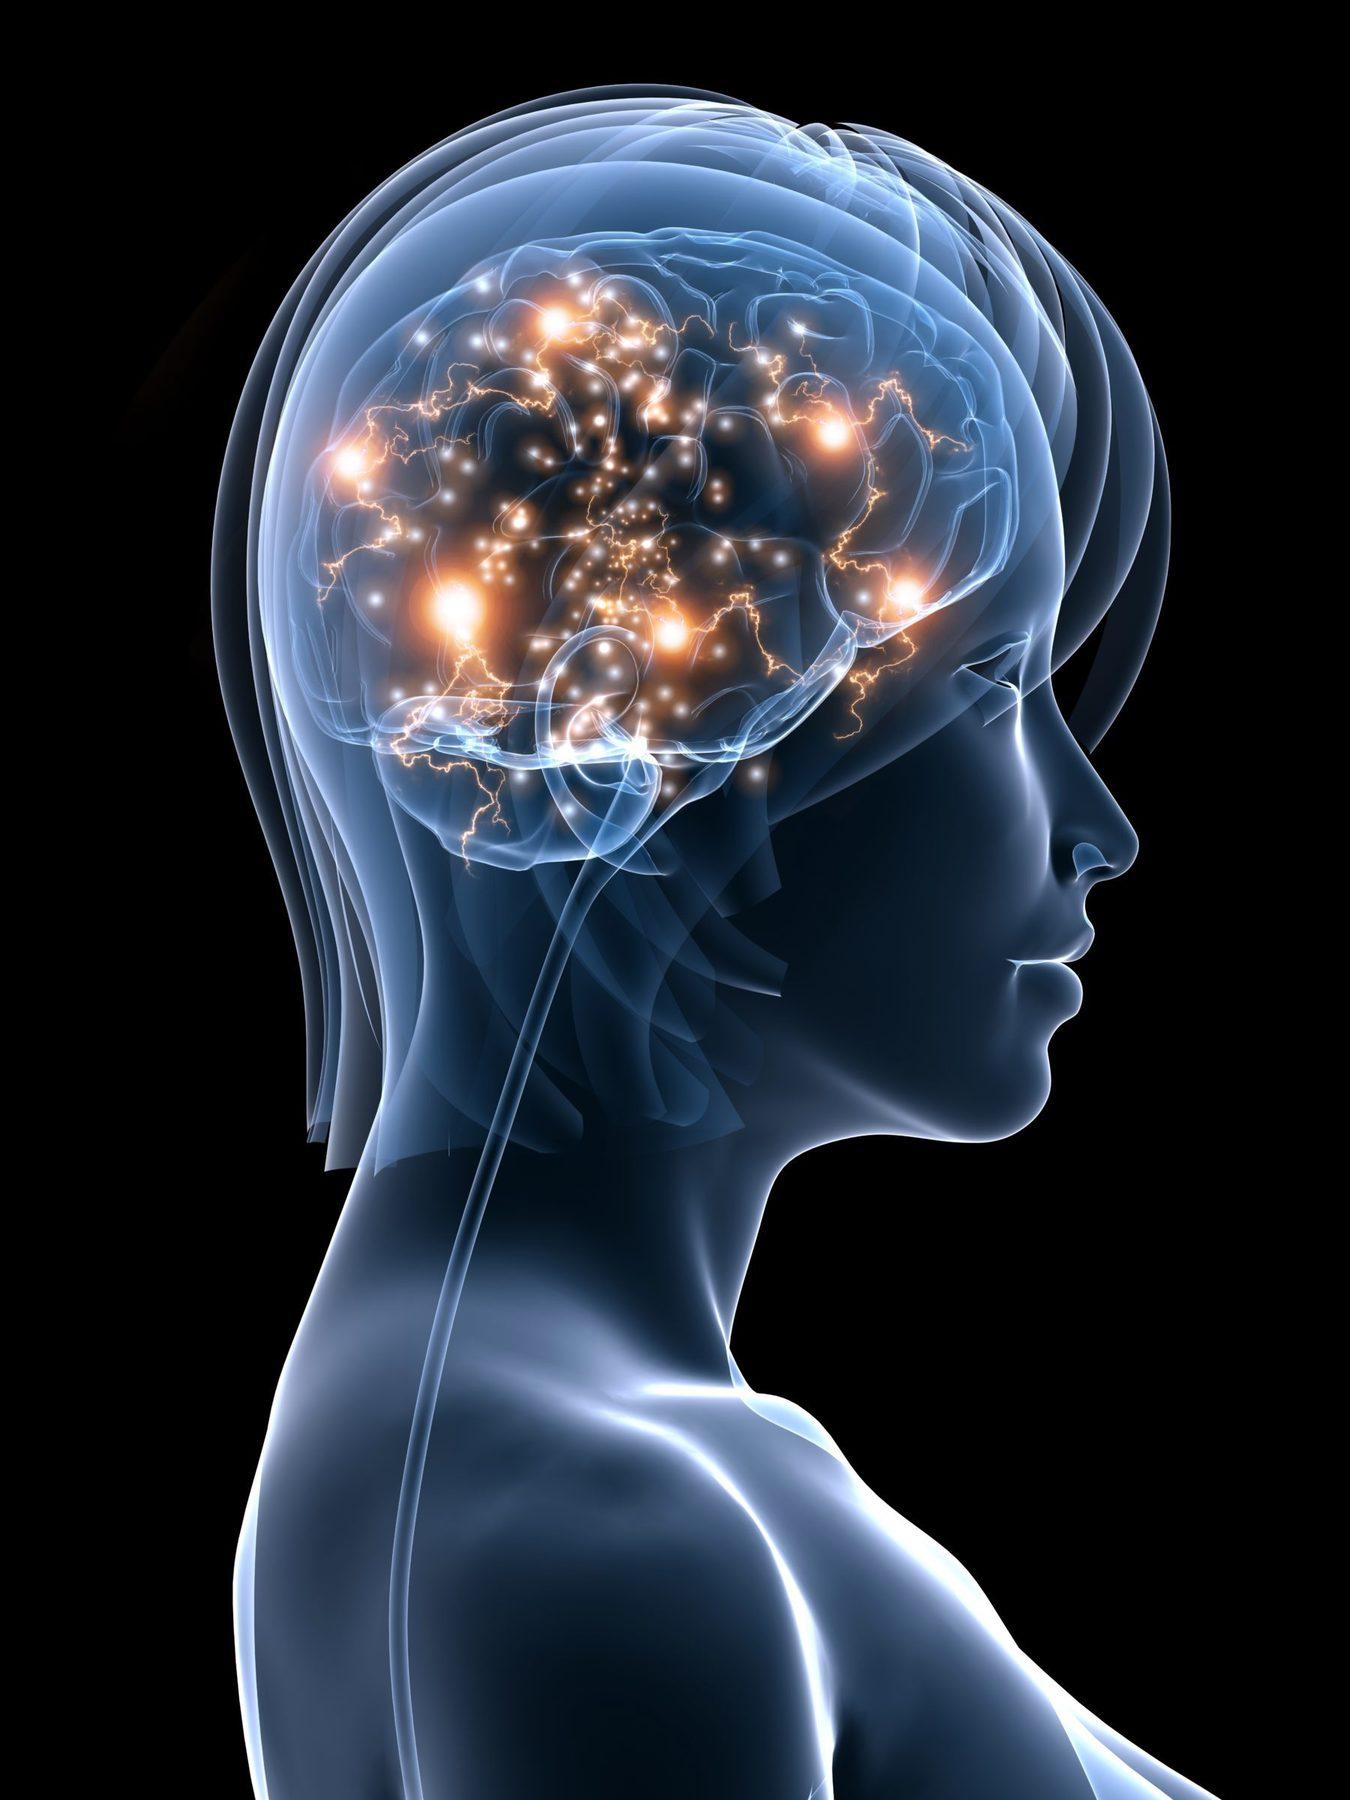 image of brain showing modern psychology process